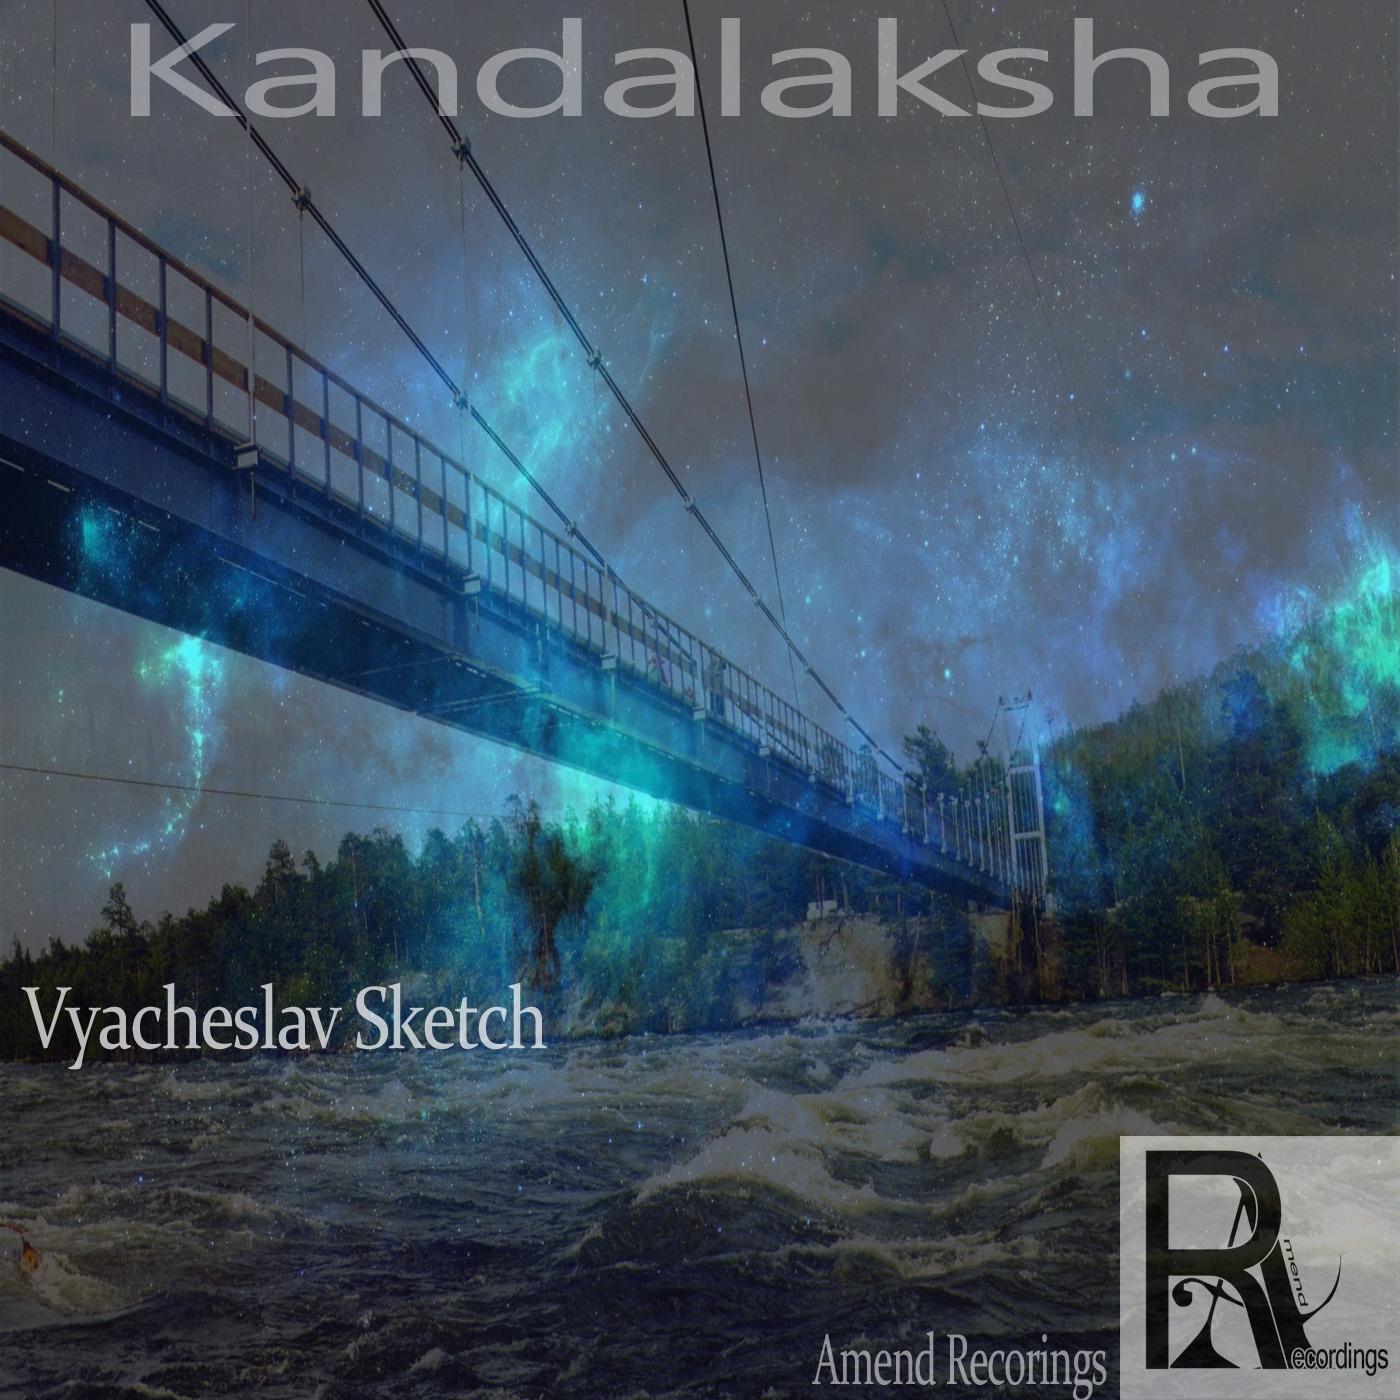 Vyacheslav Sketch  - Kandalaksha (Original mix)